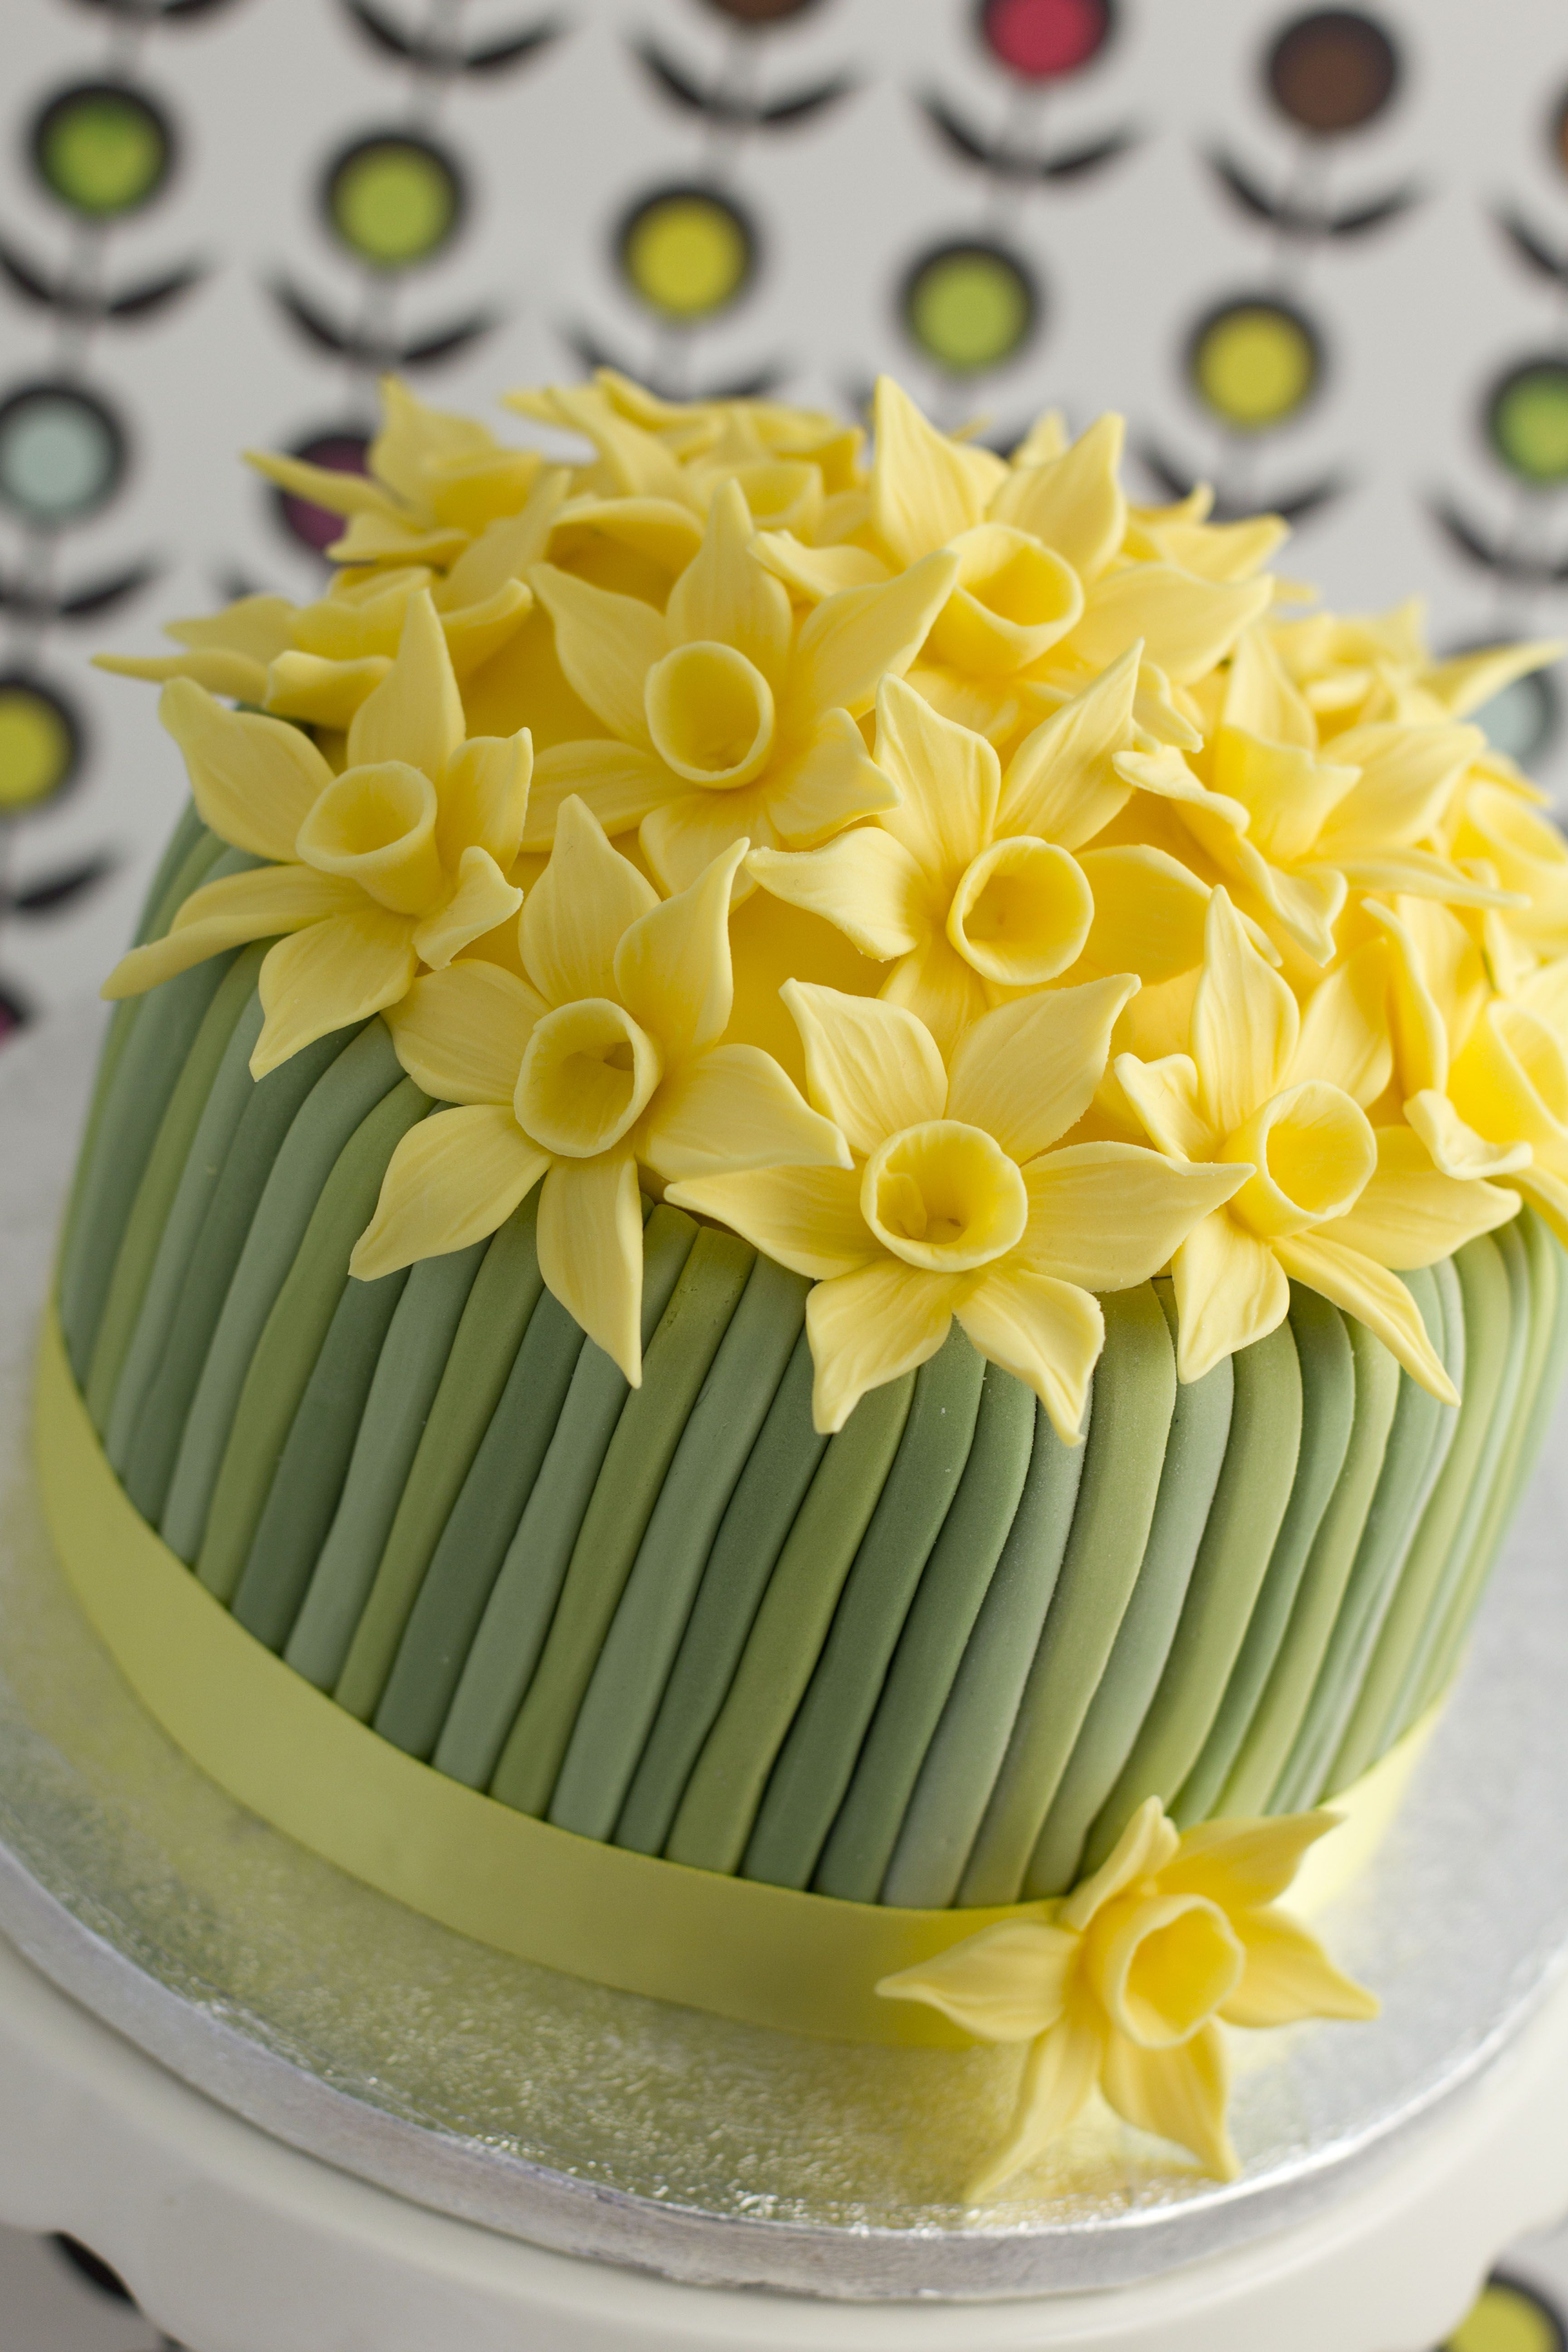 Five Spring Cakes to Make You Smile   baking cakes   Pinterest ...